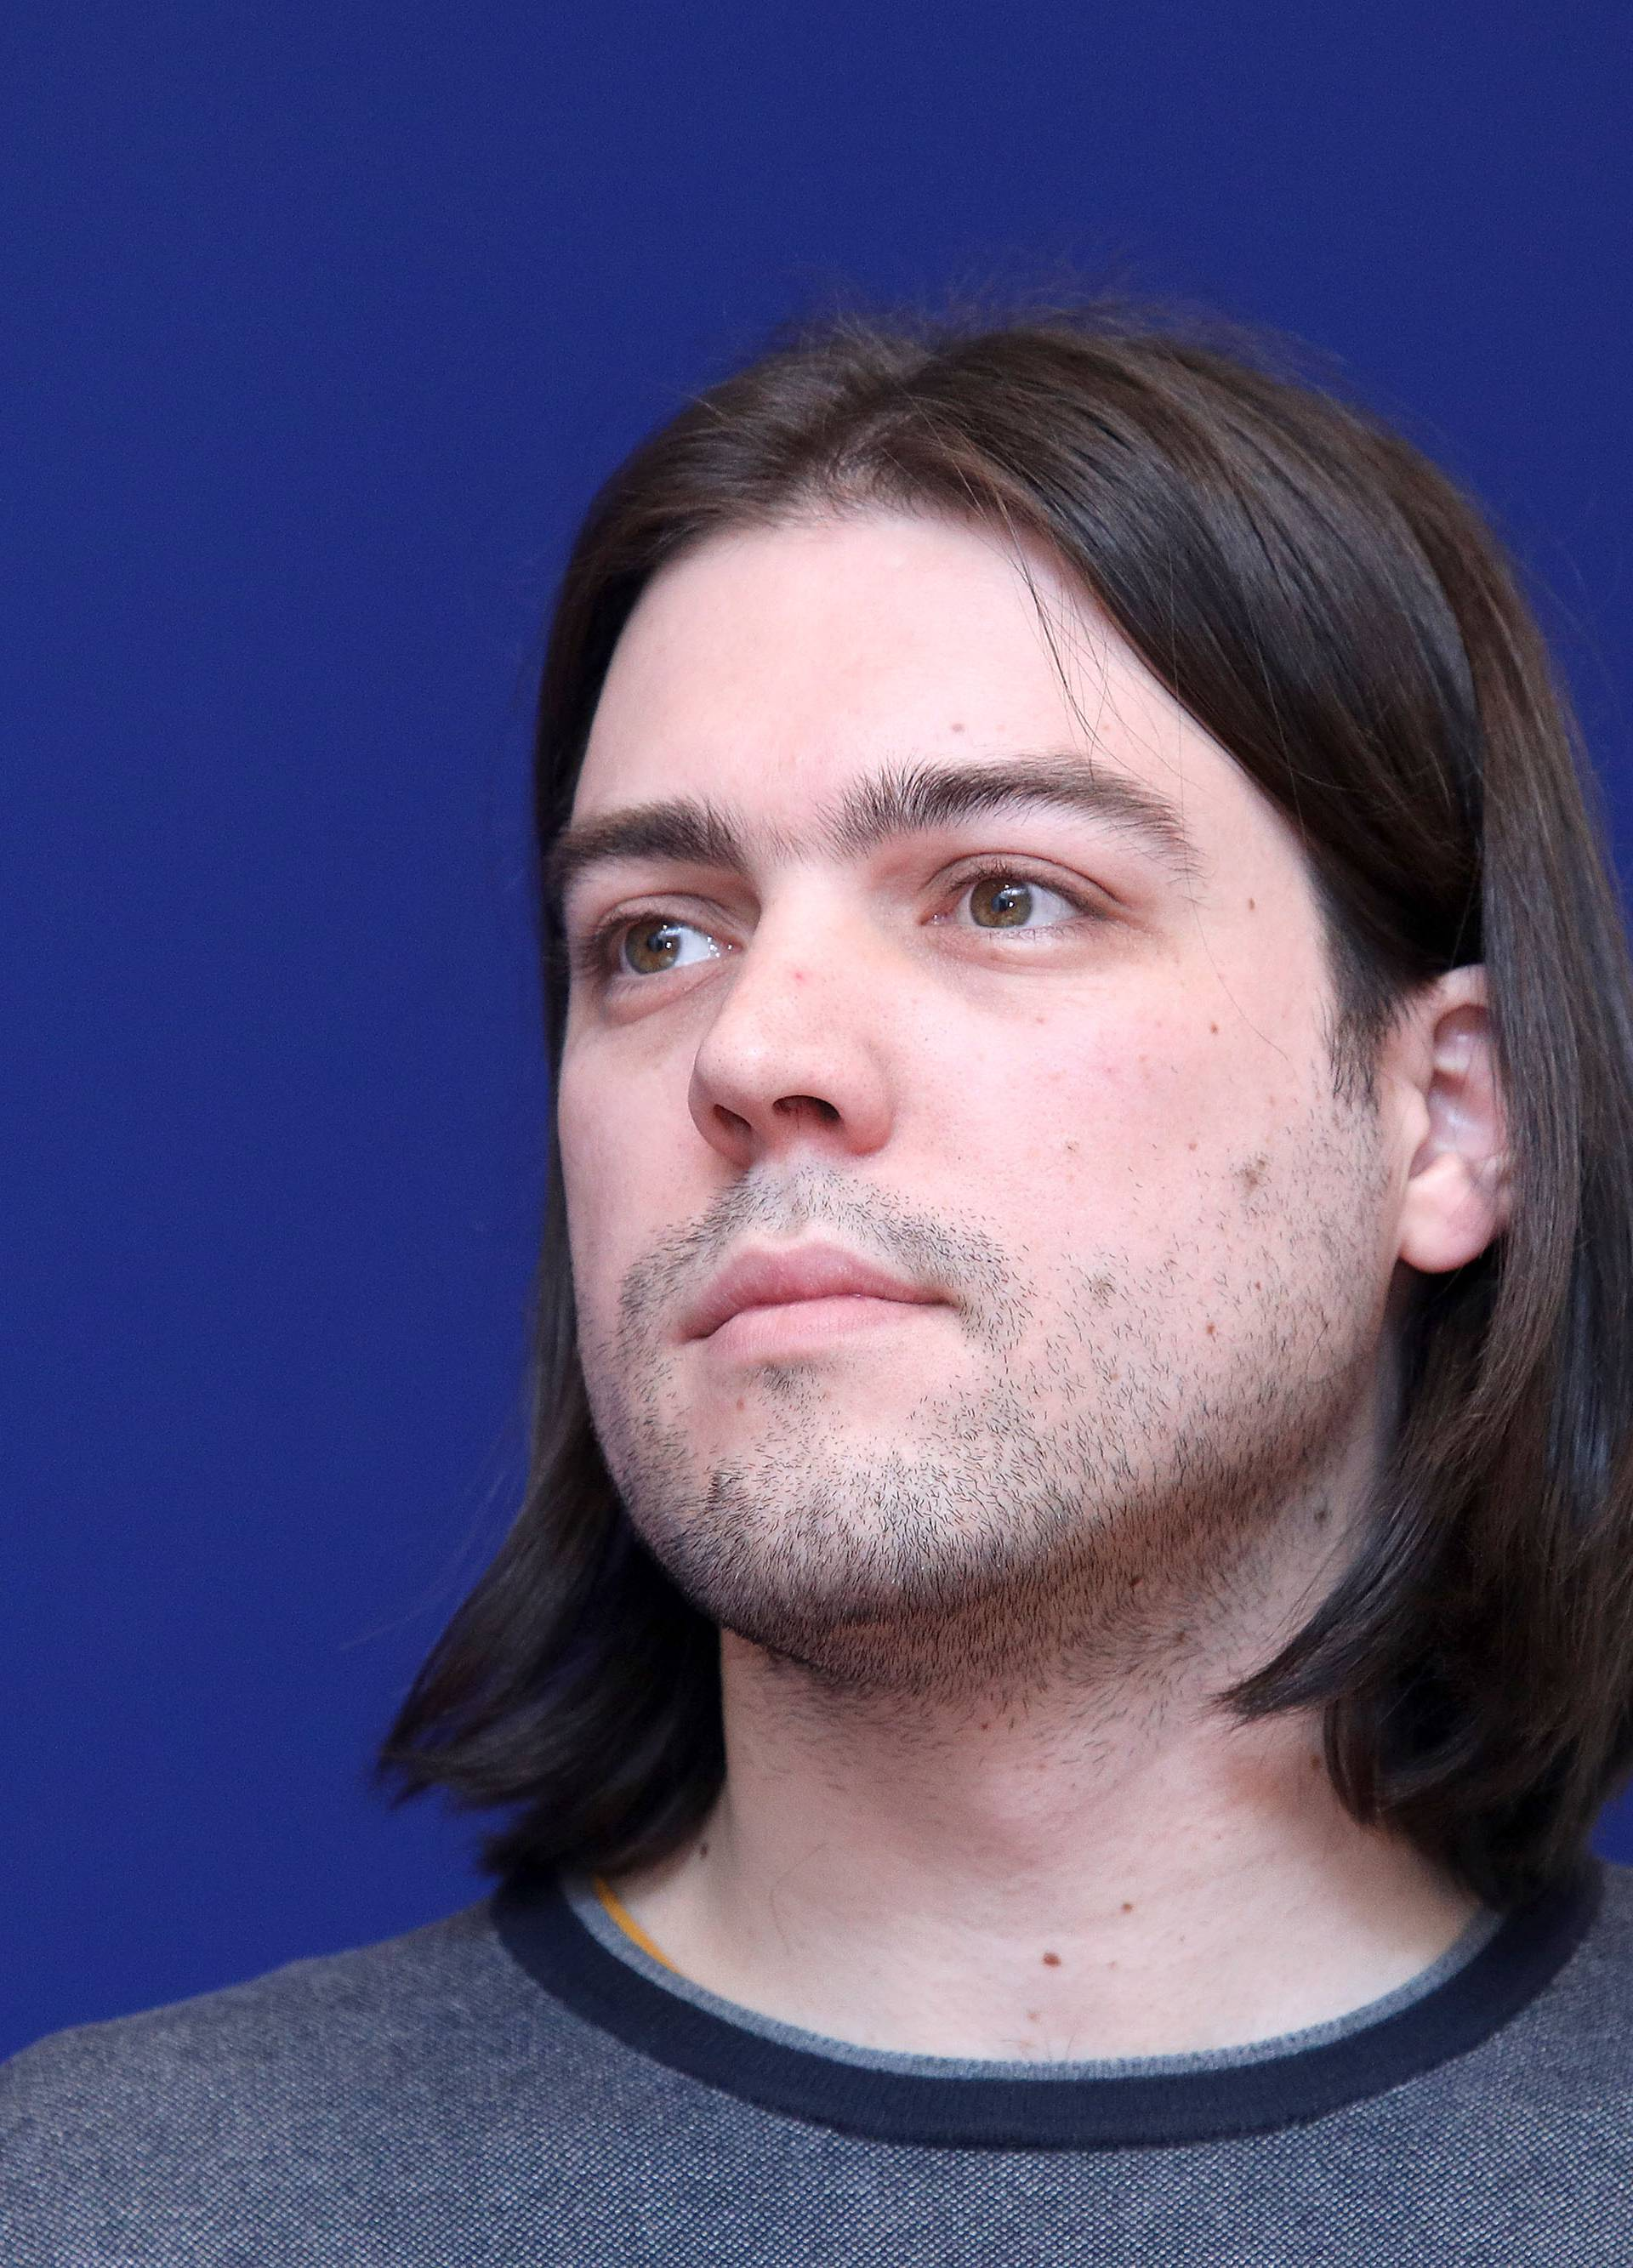 Zagreb: Živi zid govorio o najavi kaznene prijave protiv gradonačelnika Milana Bandića